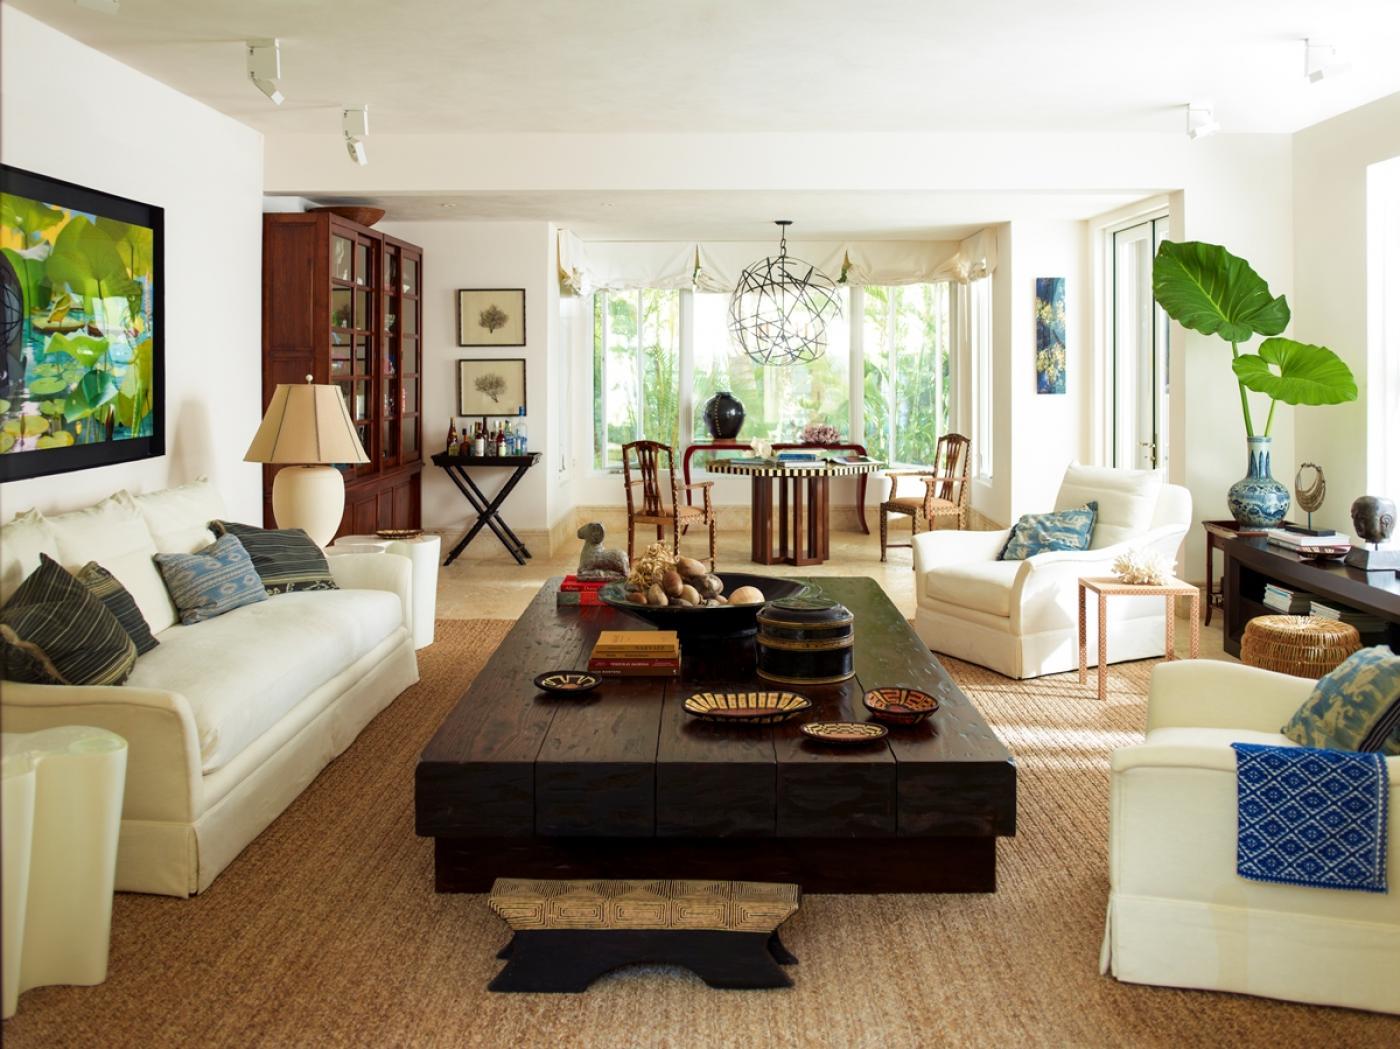 Las Hamacas Residence Lush Serene Paradise by Juan